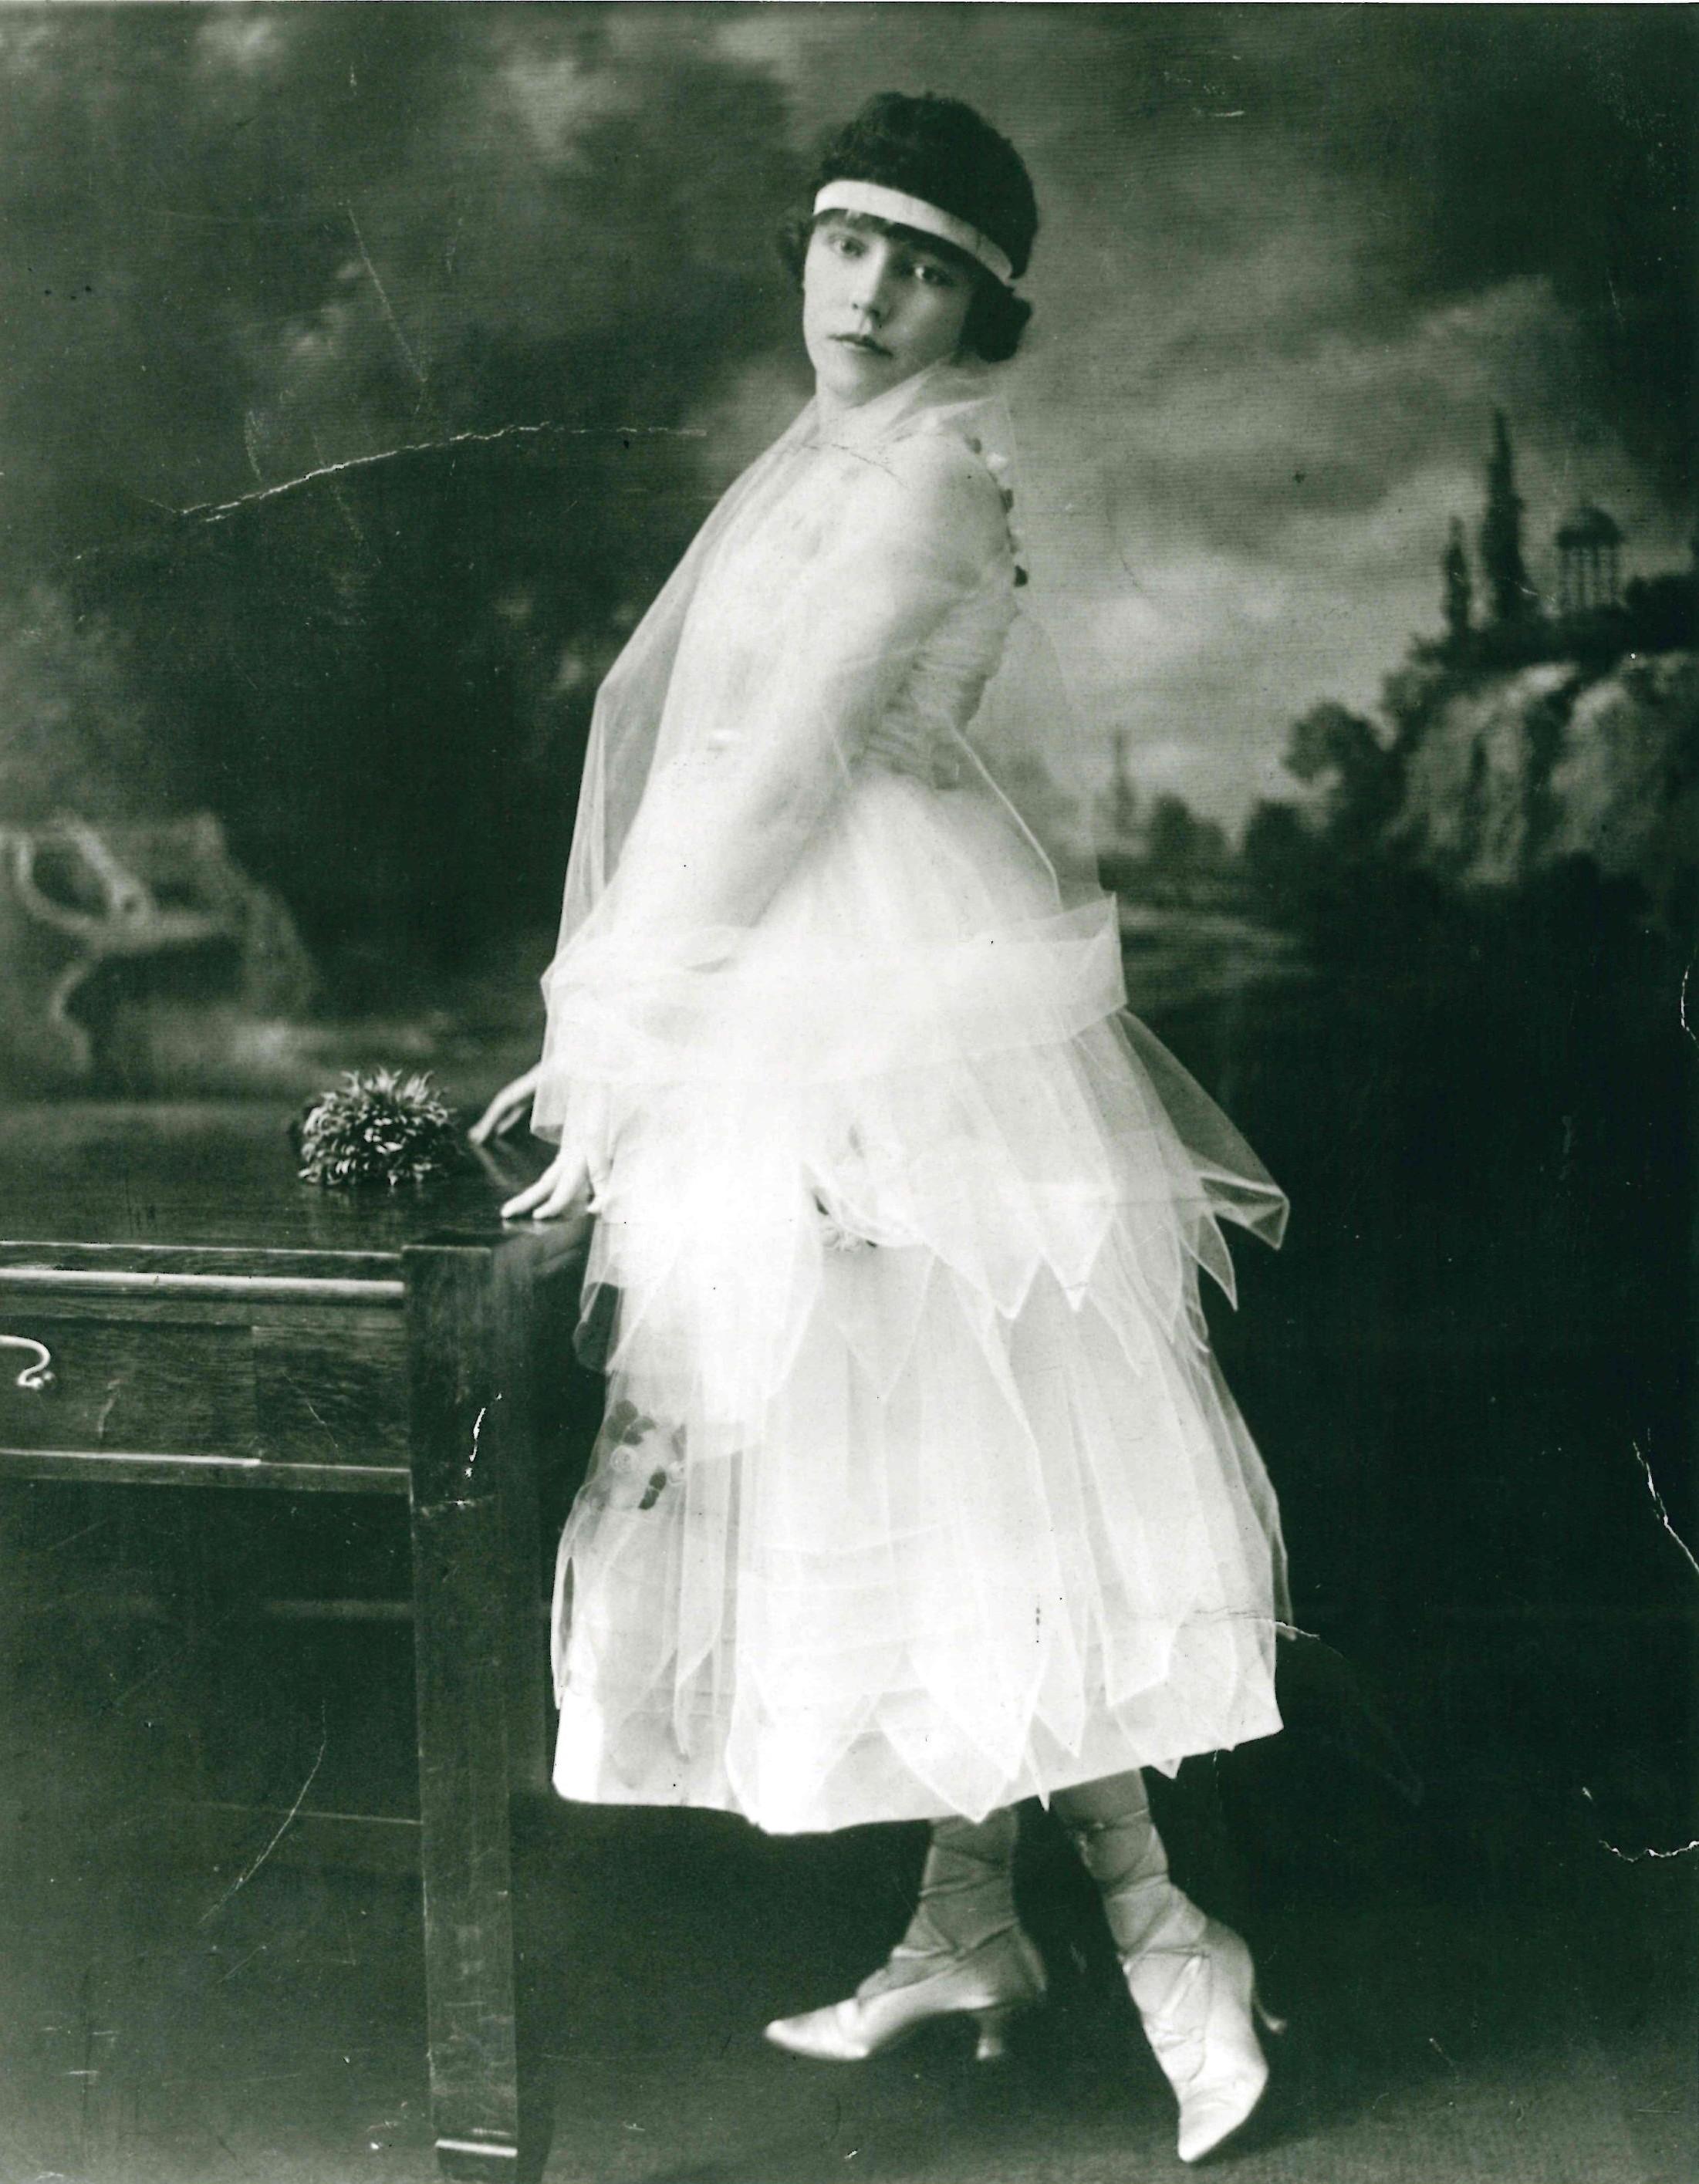 Image 7, Dorothy Lougheed, c. 1920s